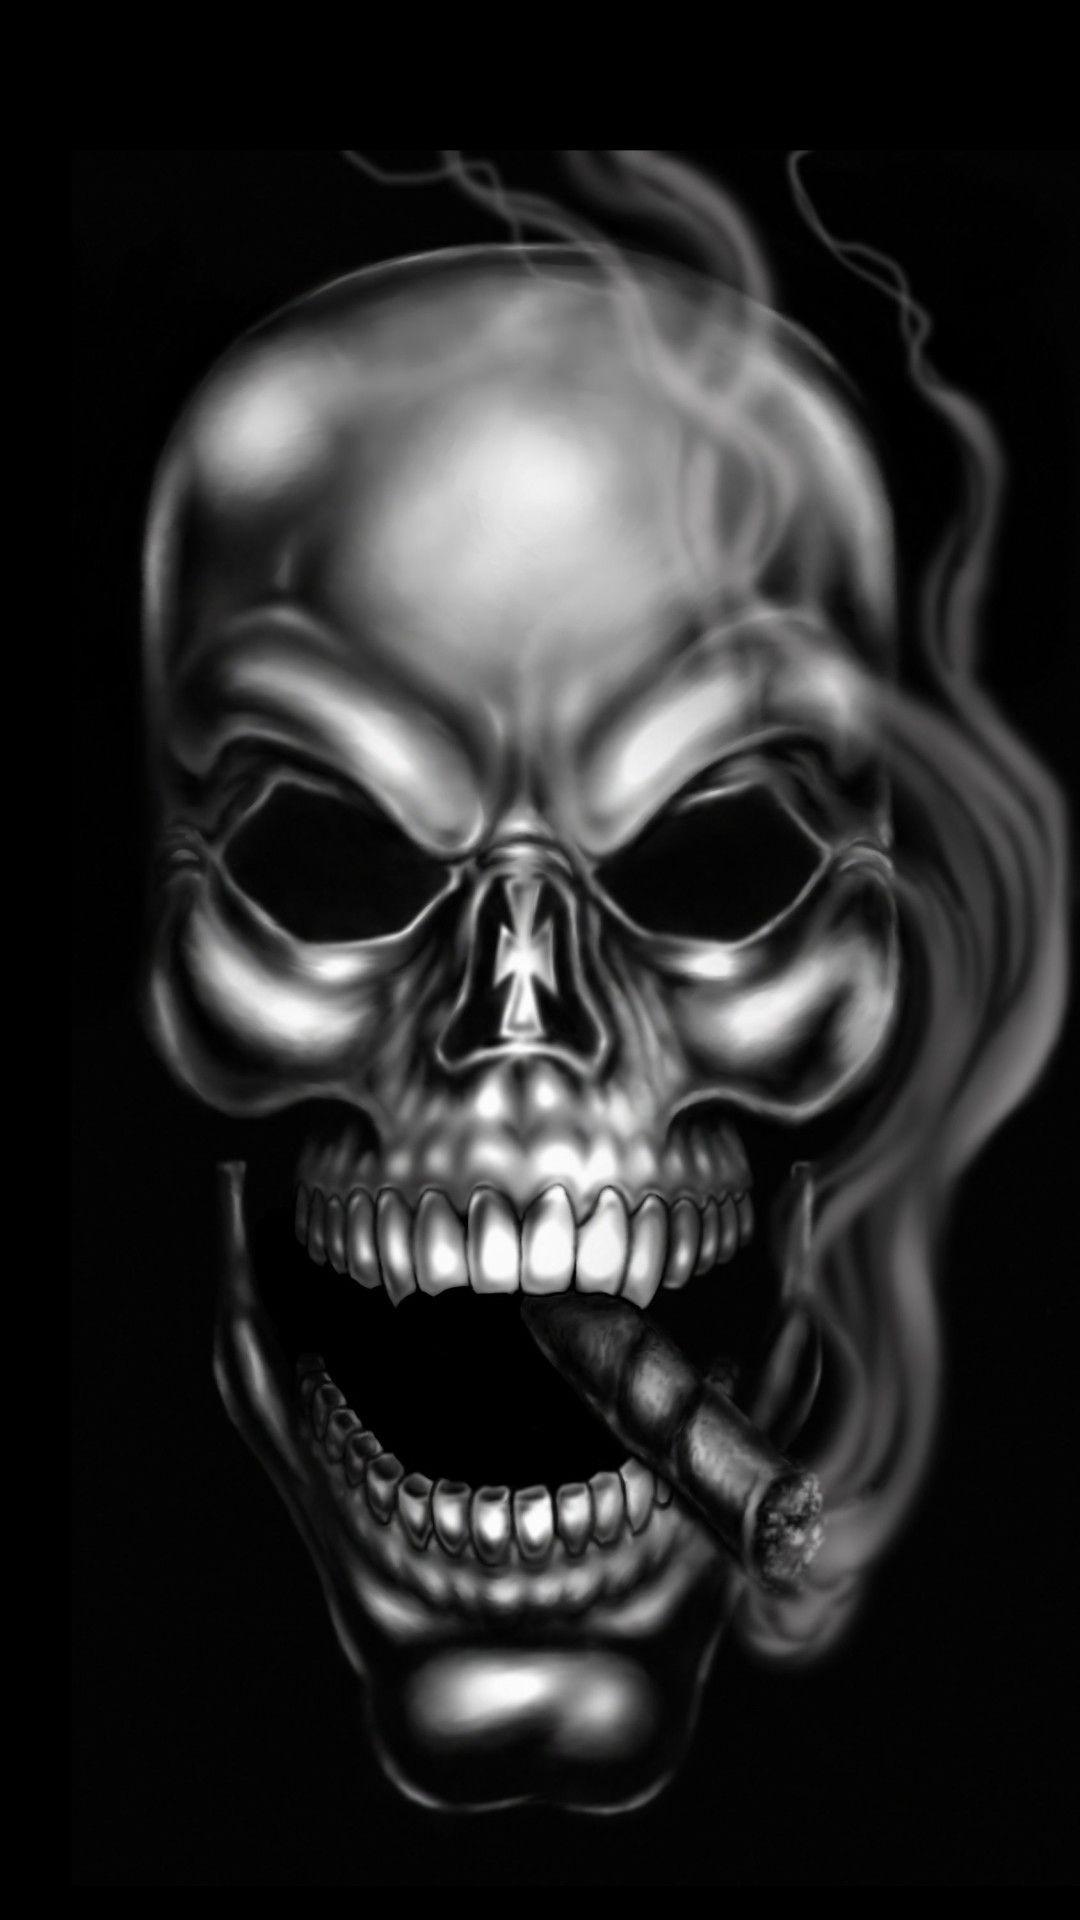 4482x3018 Blue And Black Skull Wallpaper HD